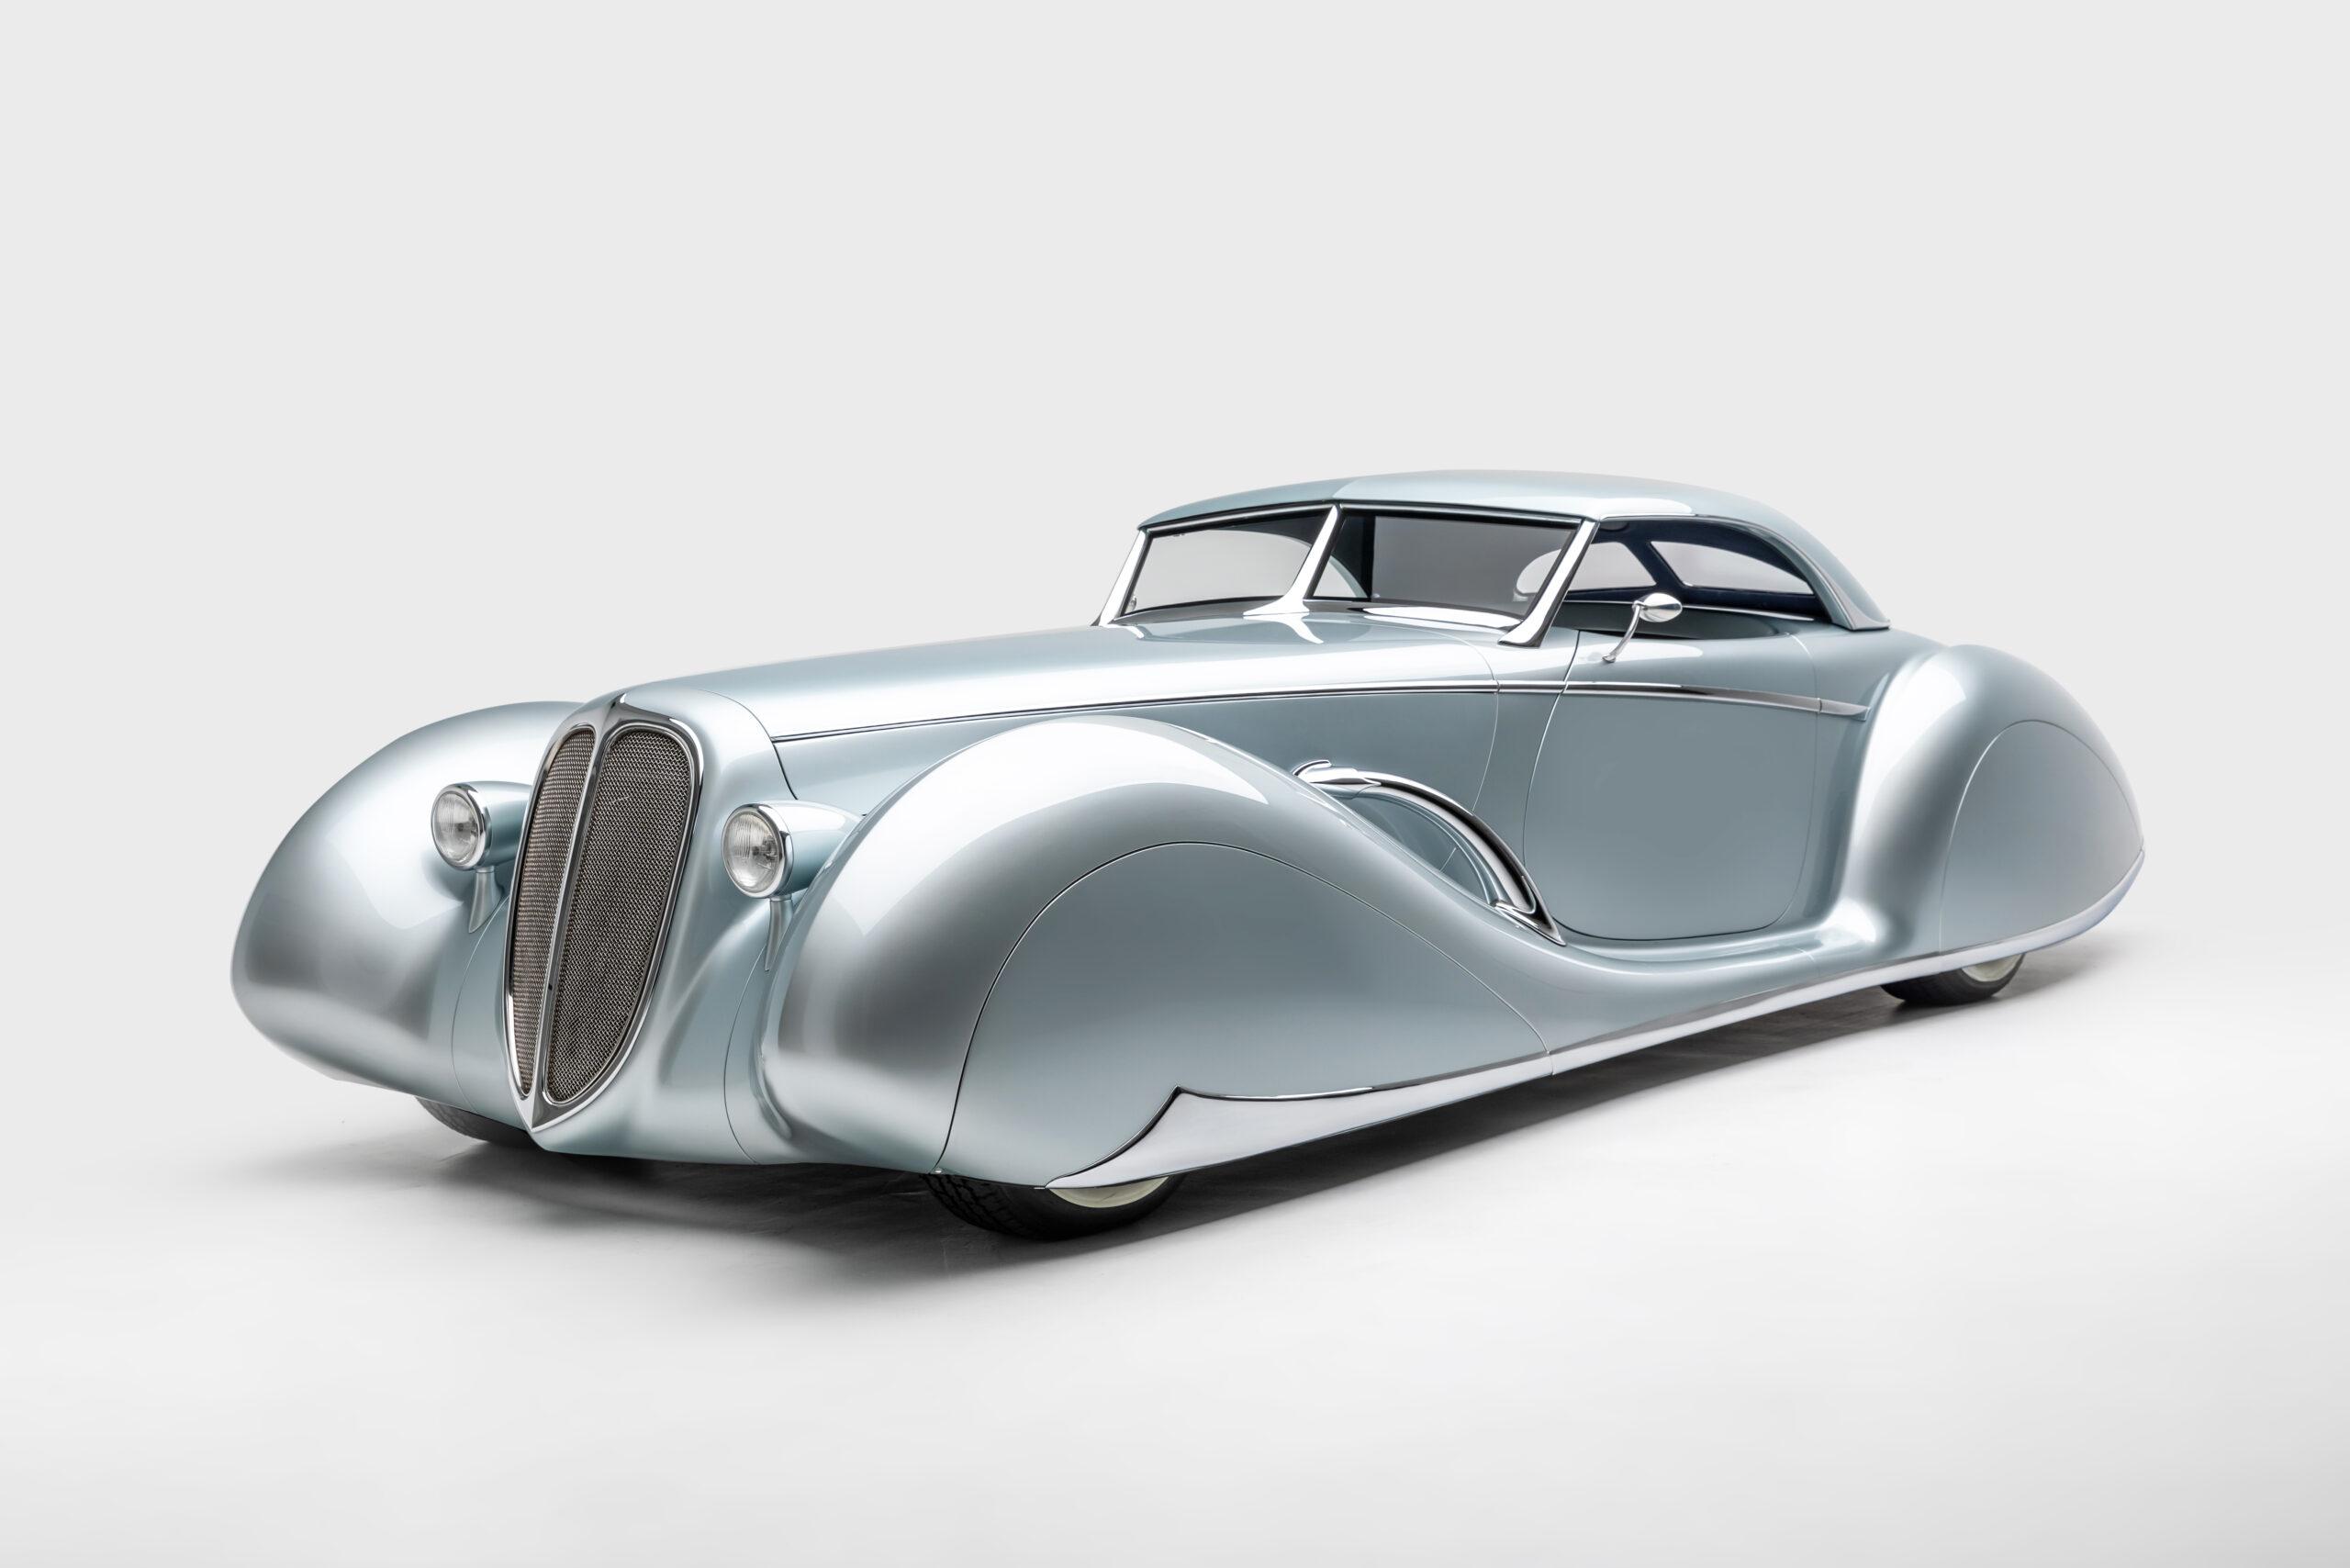 Aquarius (1934 Packard)